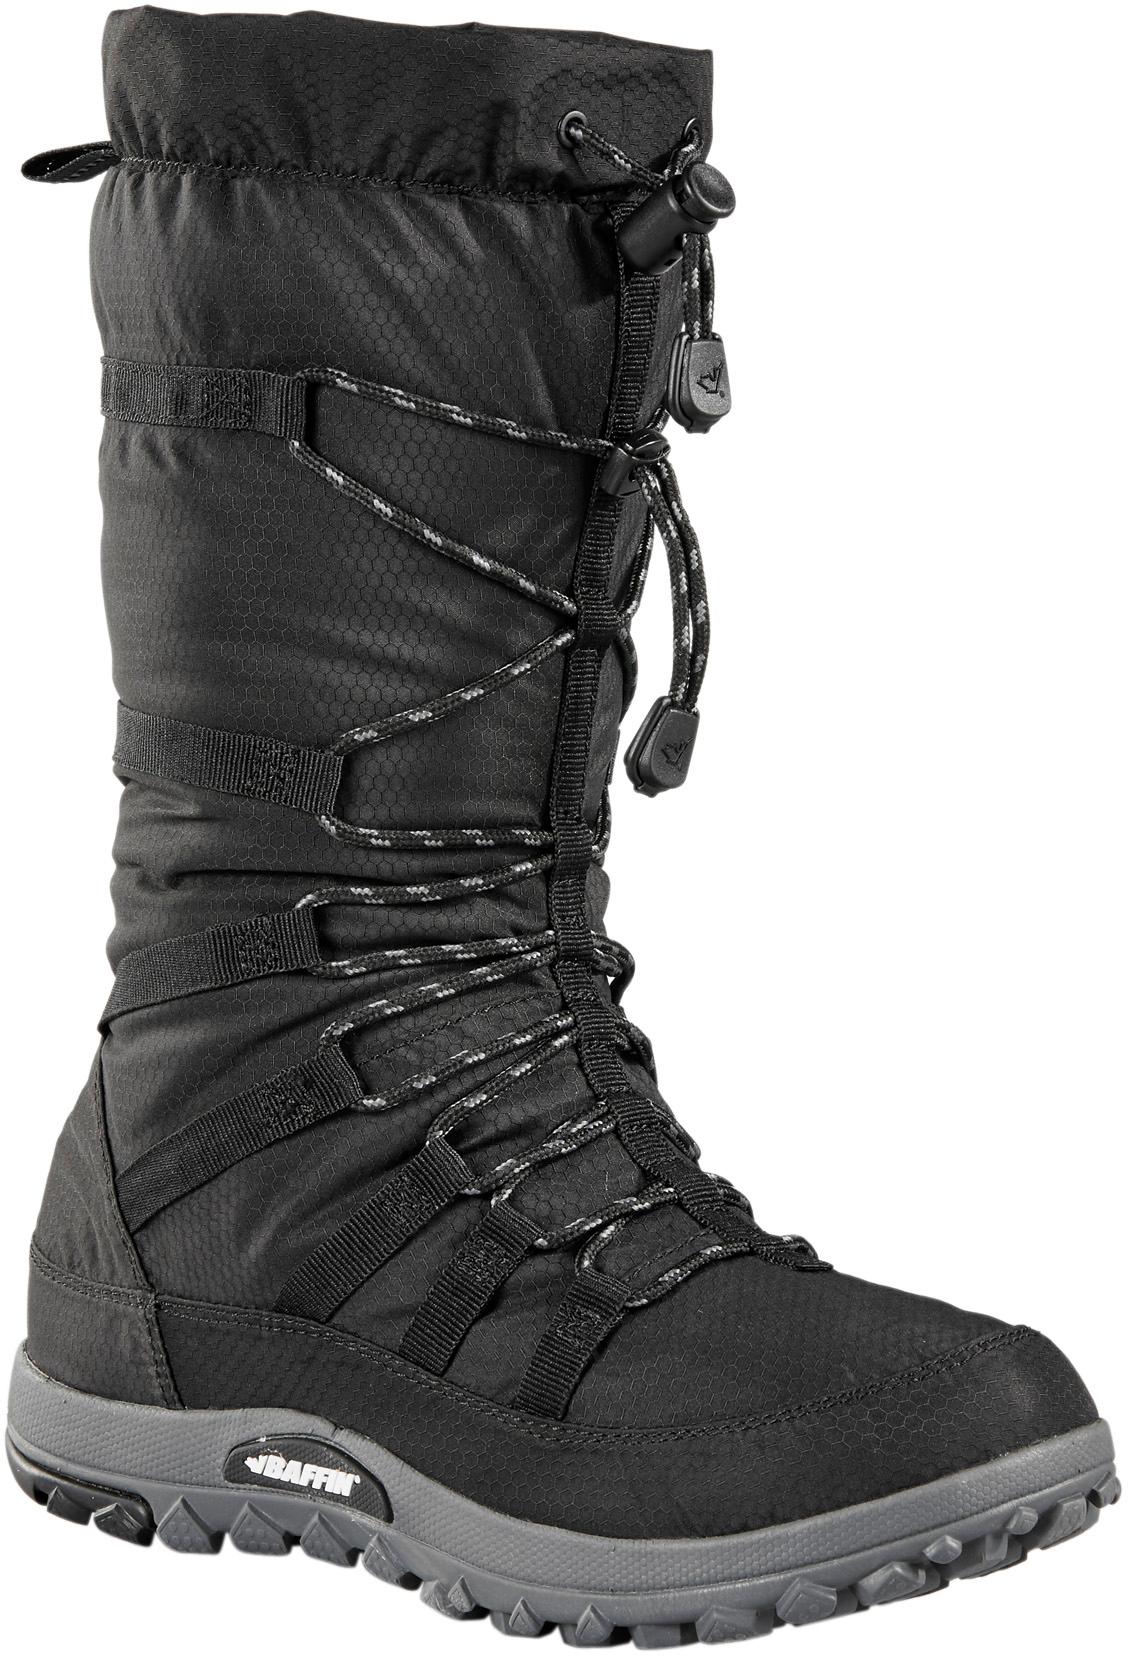 Baffin Escalate Waterproof Winter Boots